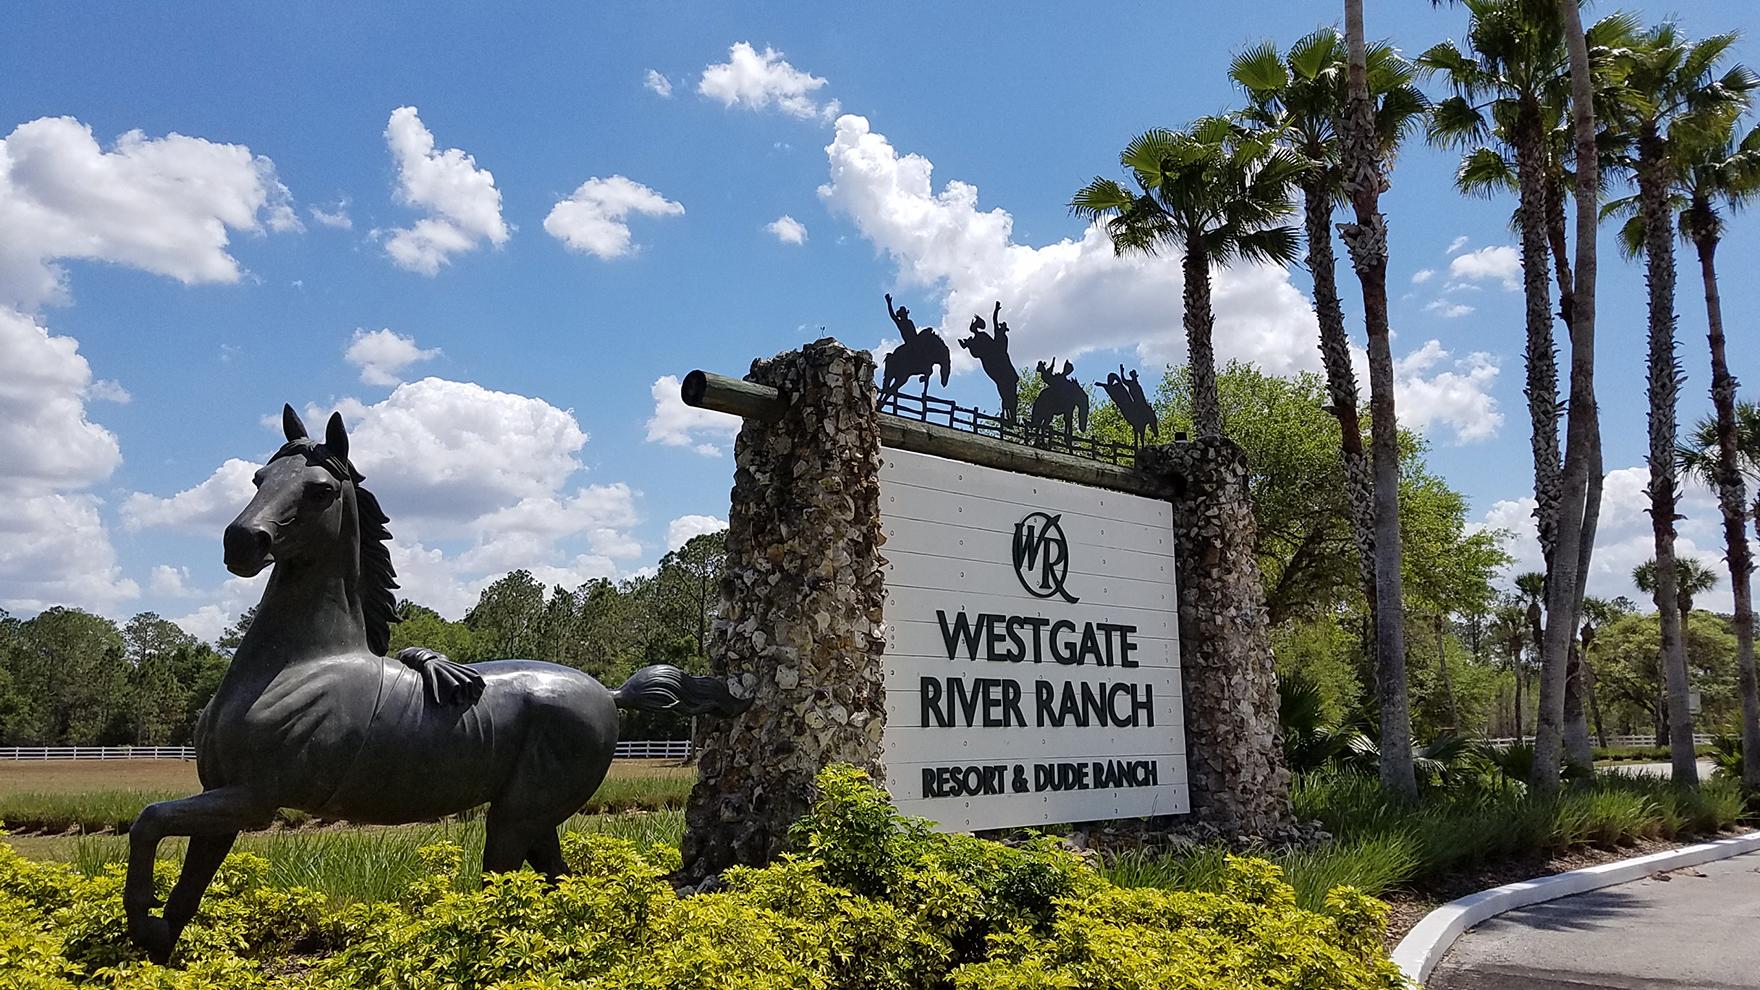 Entrada da propriedade. Foto: Visit Central Florida.